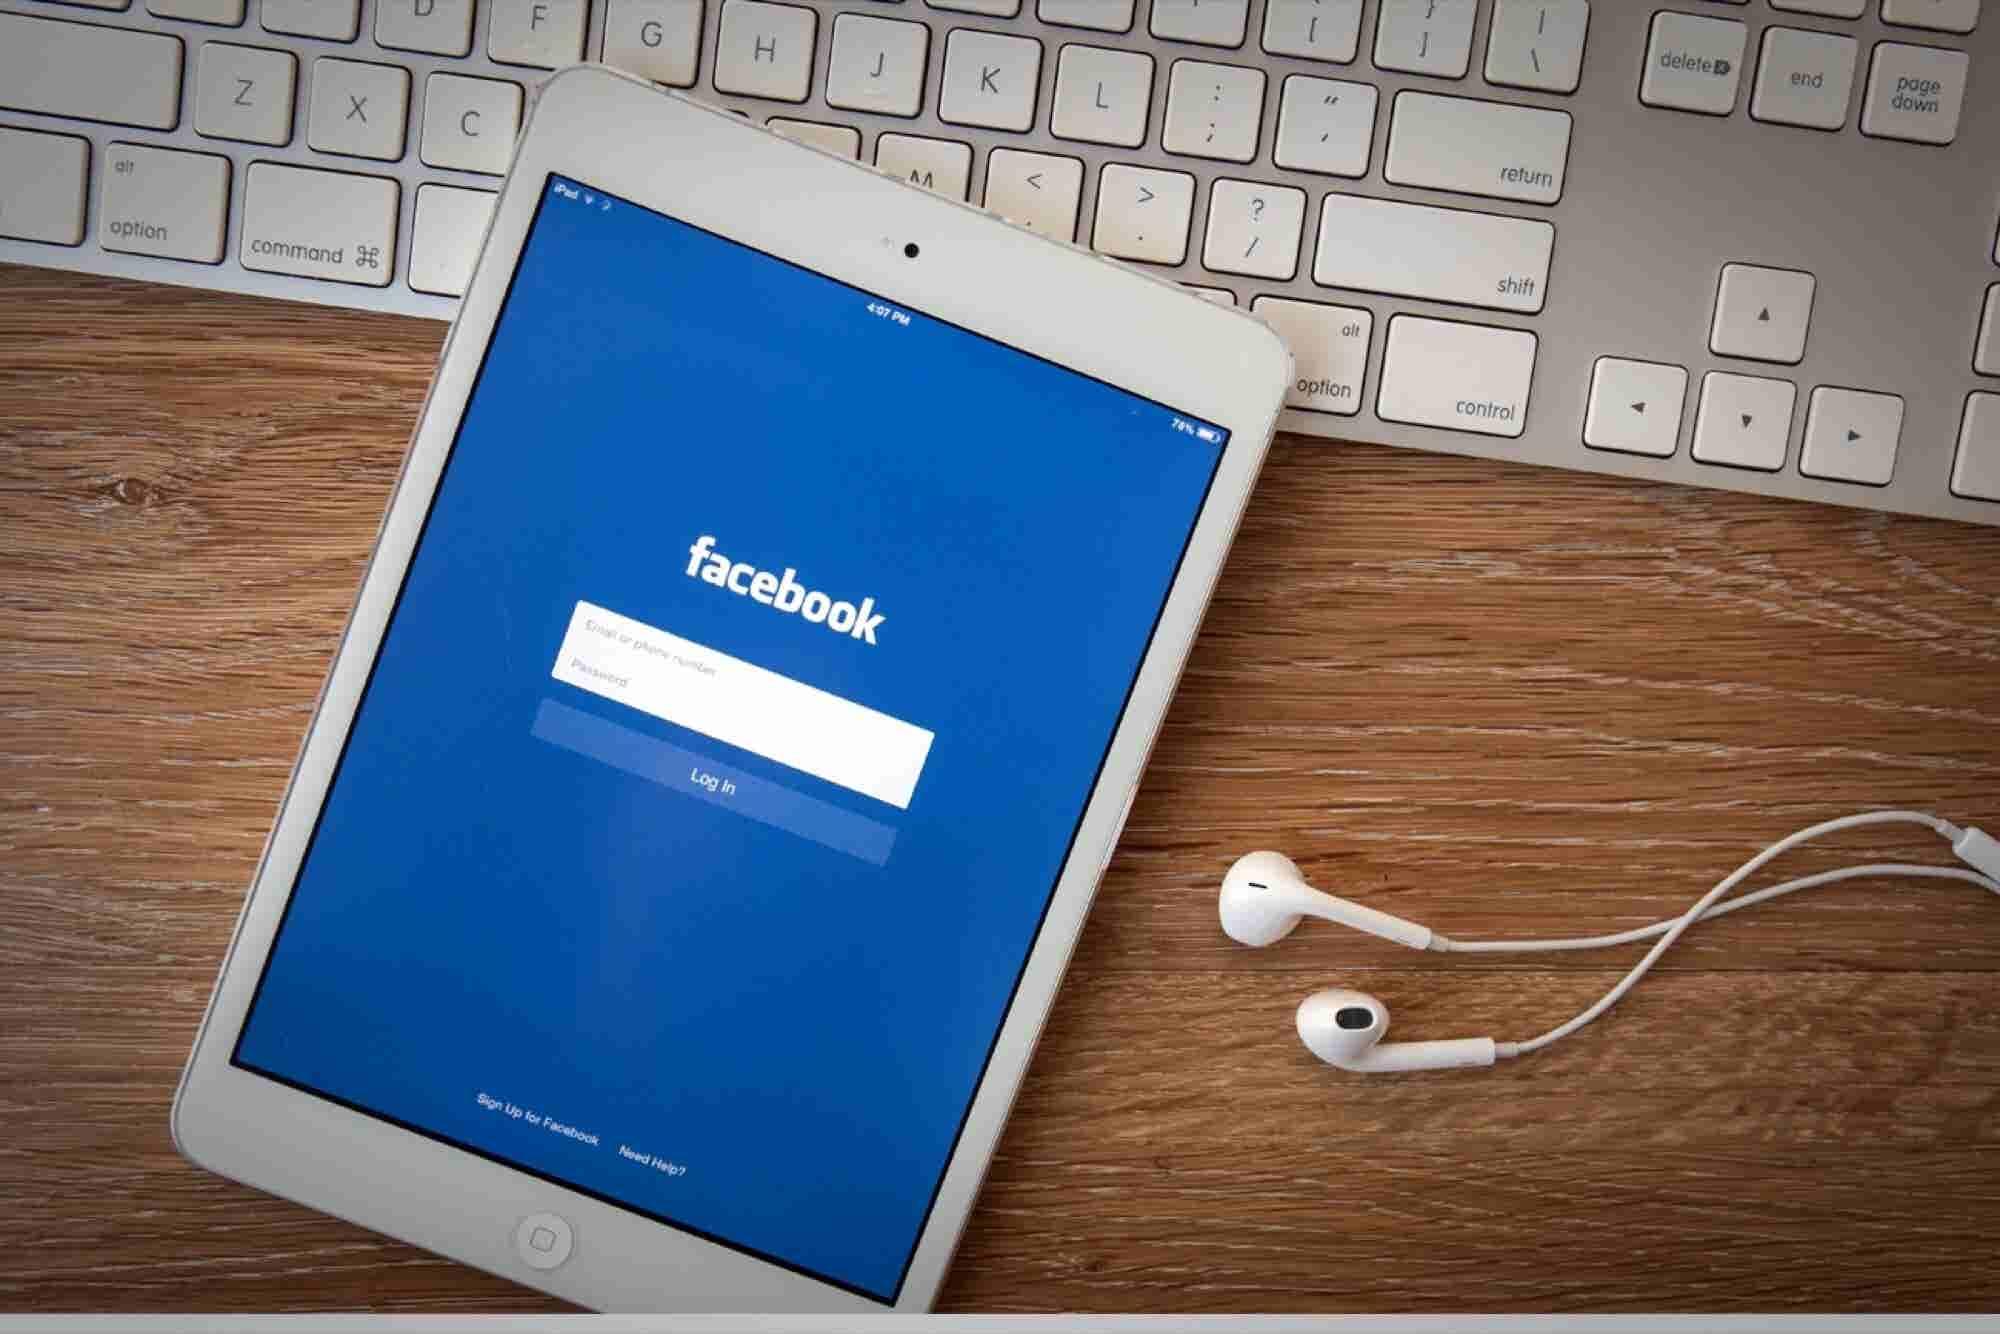 Fake News Story Invades Facebook Trending Topics